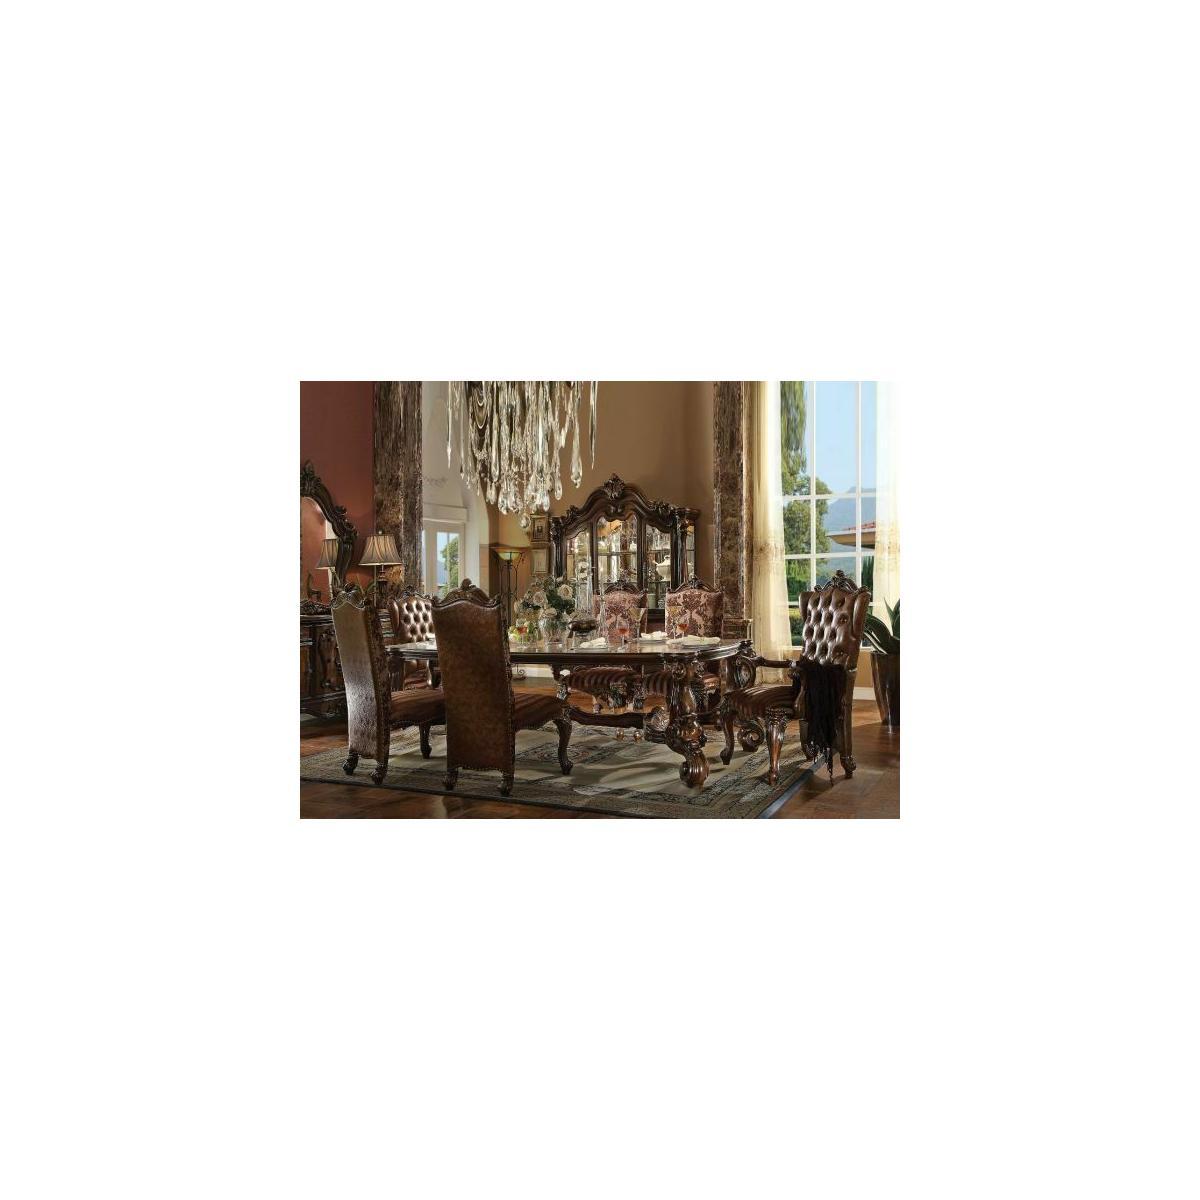 ACME Versailles Dining Table - 61115 - Cherry Oak